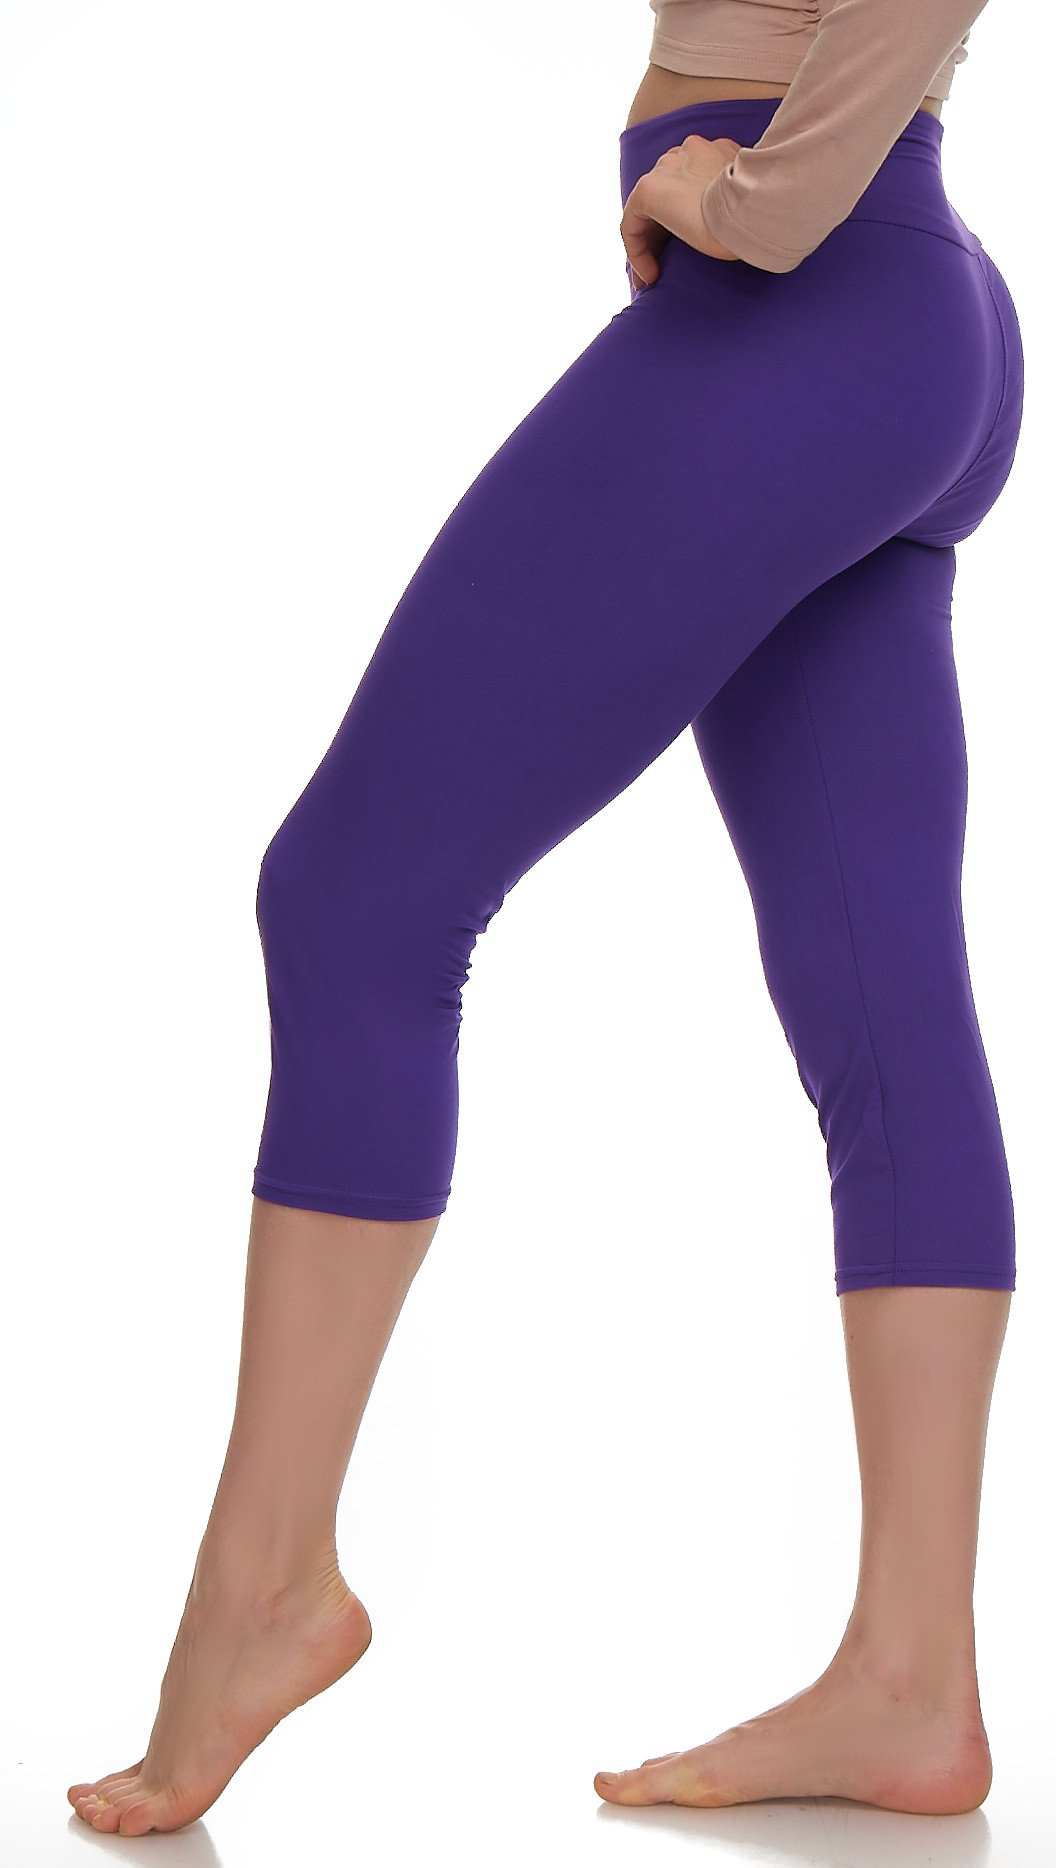 Lush Moda Extra Soft Leggings Variety of ColorsPlus Size Yoga Waist Purple, One Size fits Most (XL 3XL), Purple Yoga Waist by LMB (Image #1)